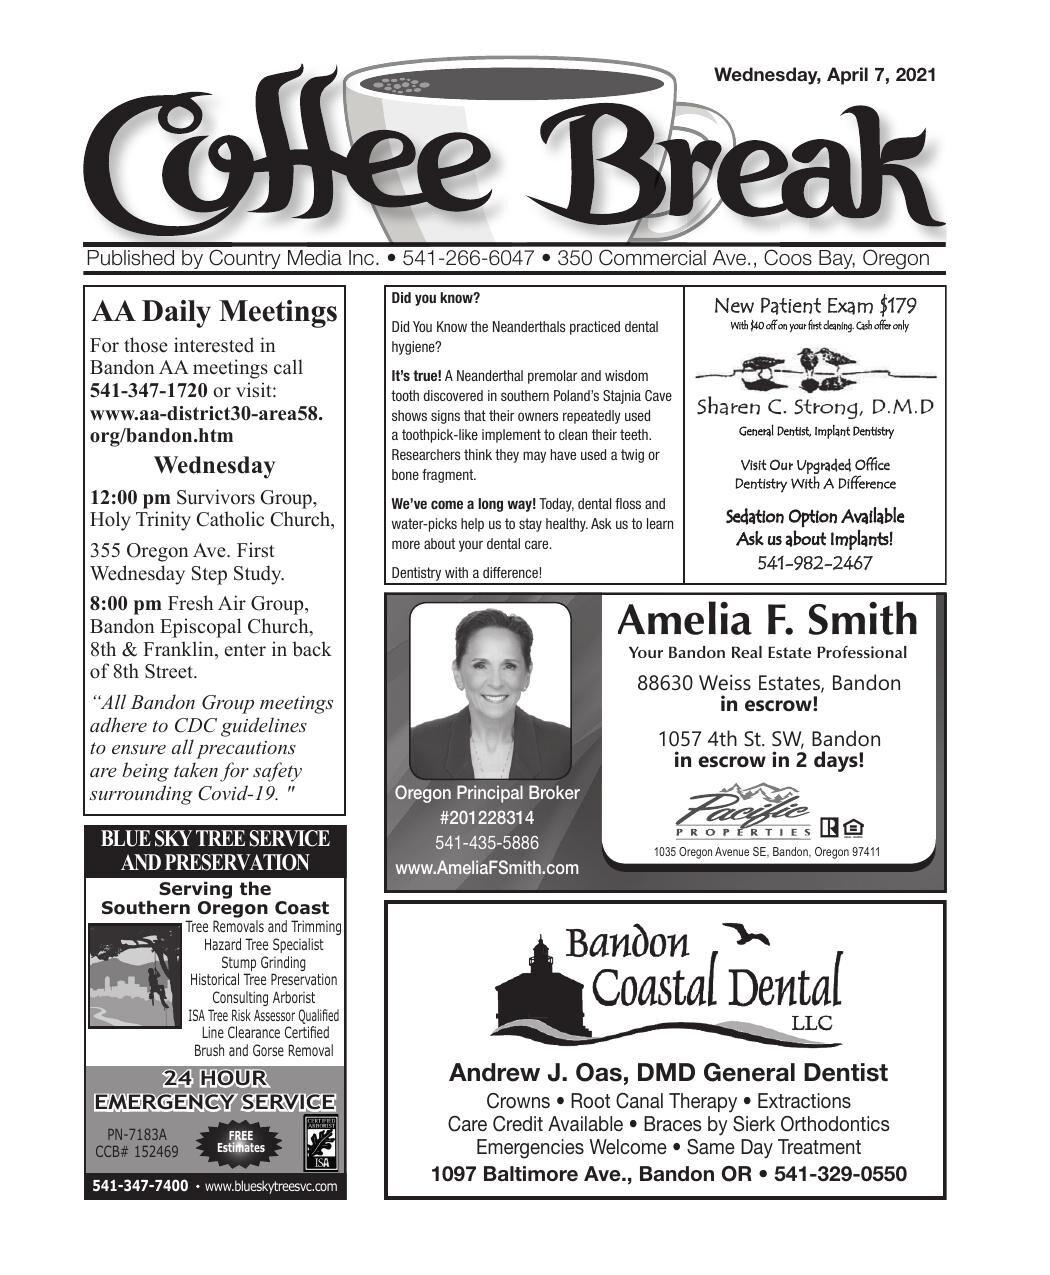 April 7, 2021 Coffee Break